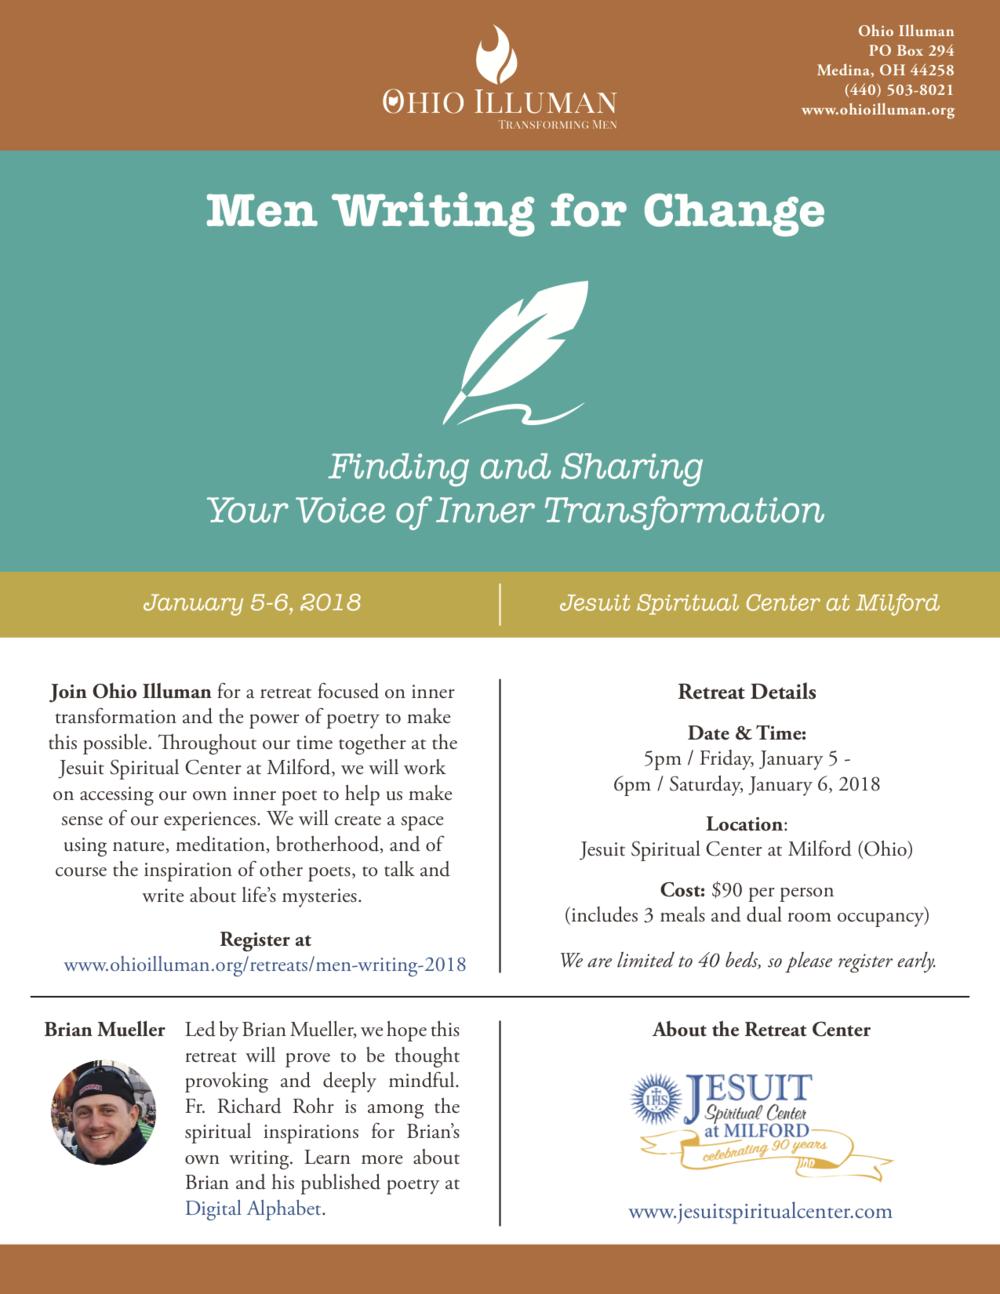 Men Writing for Change - Event Flier